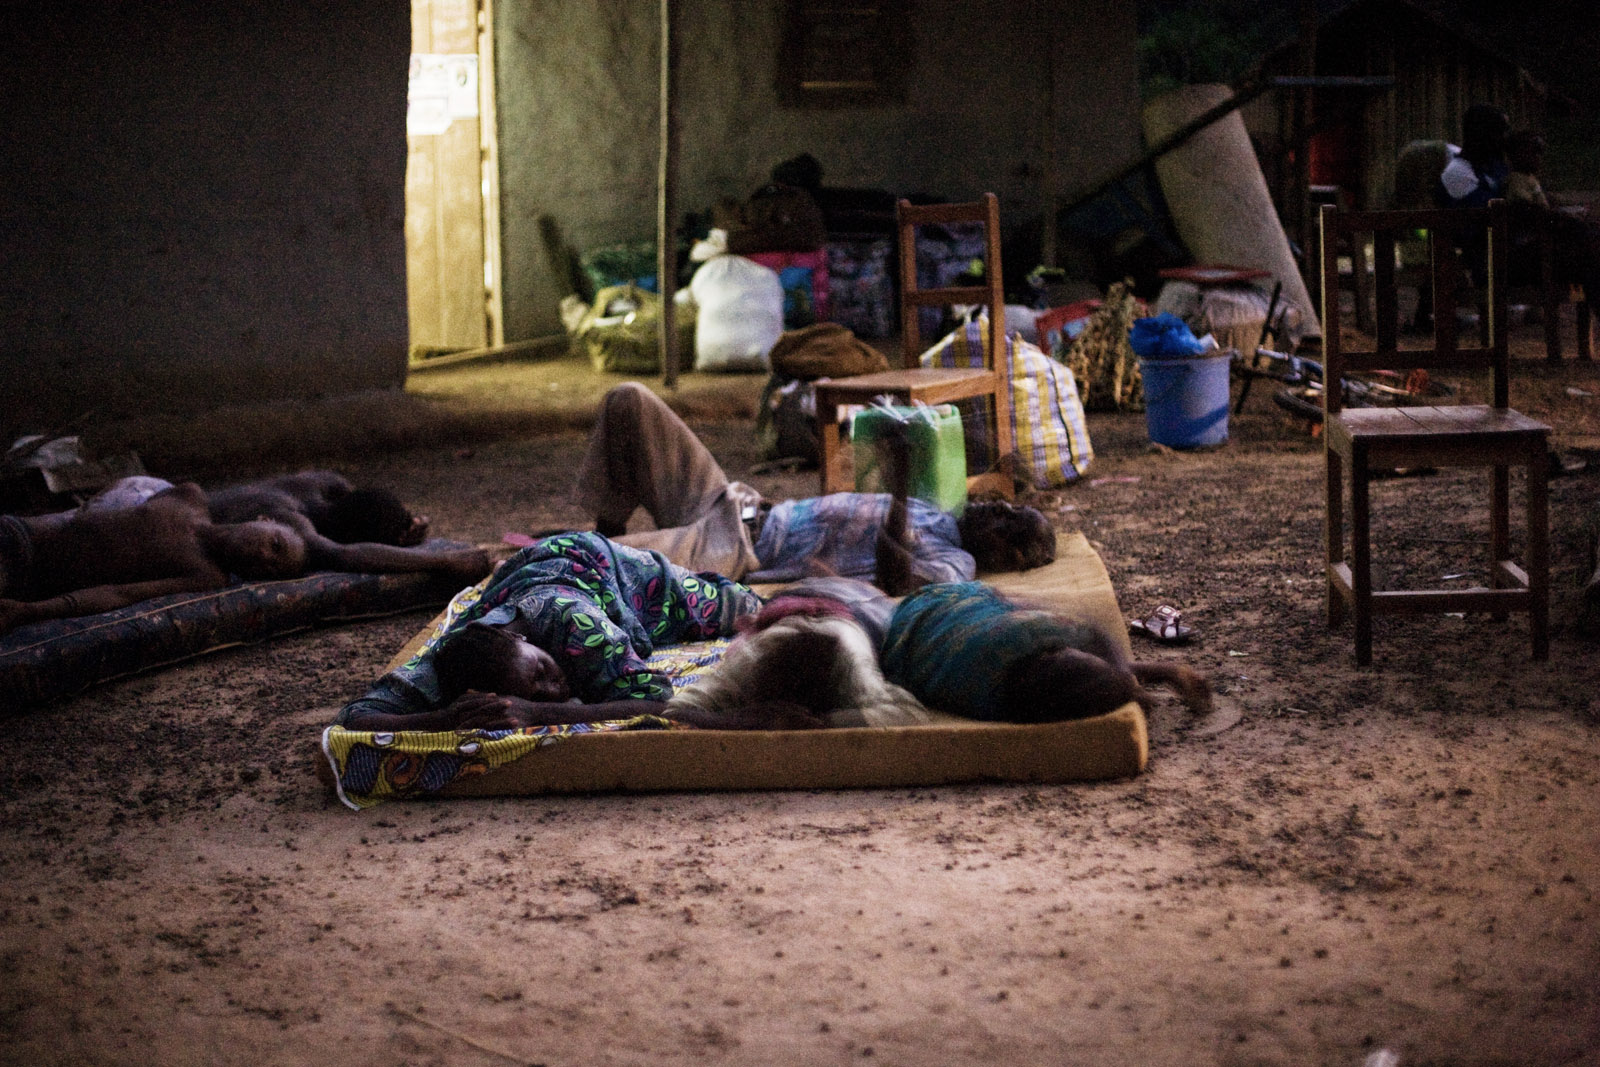 liberia-refugies-ivoiriens-0311-0722hd